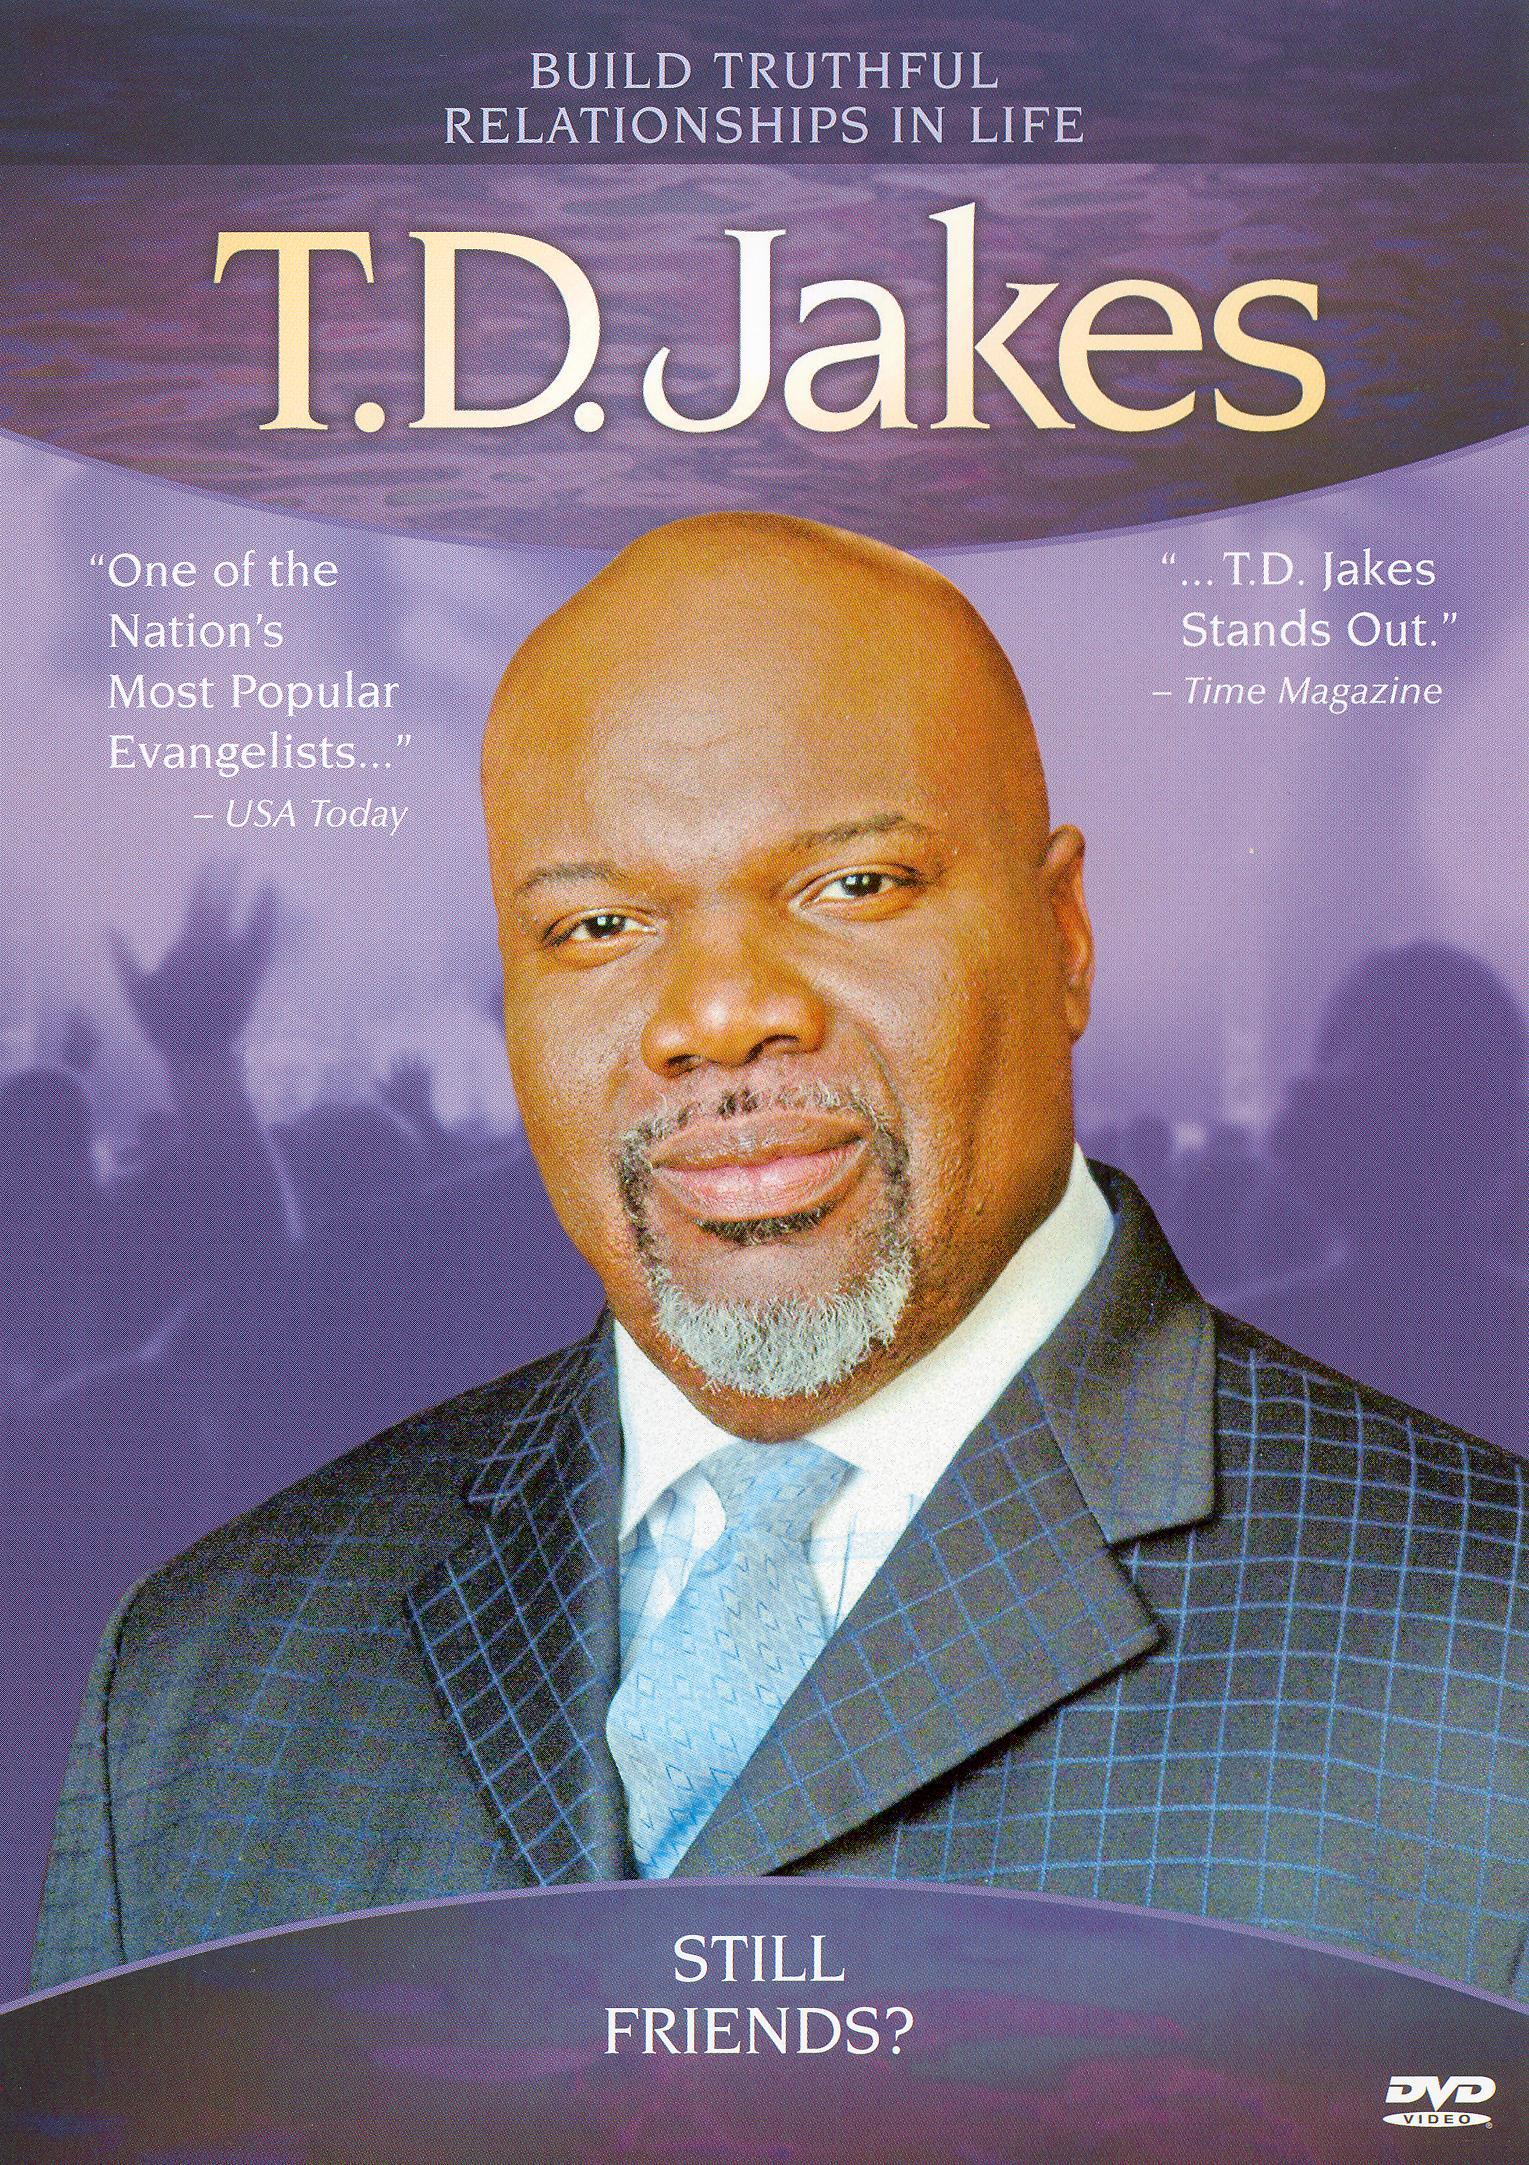 T.D. Jakes: The Potter House Presents: T.D. Jakes - Still Friends